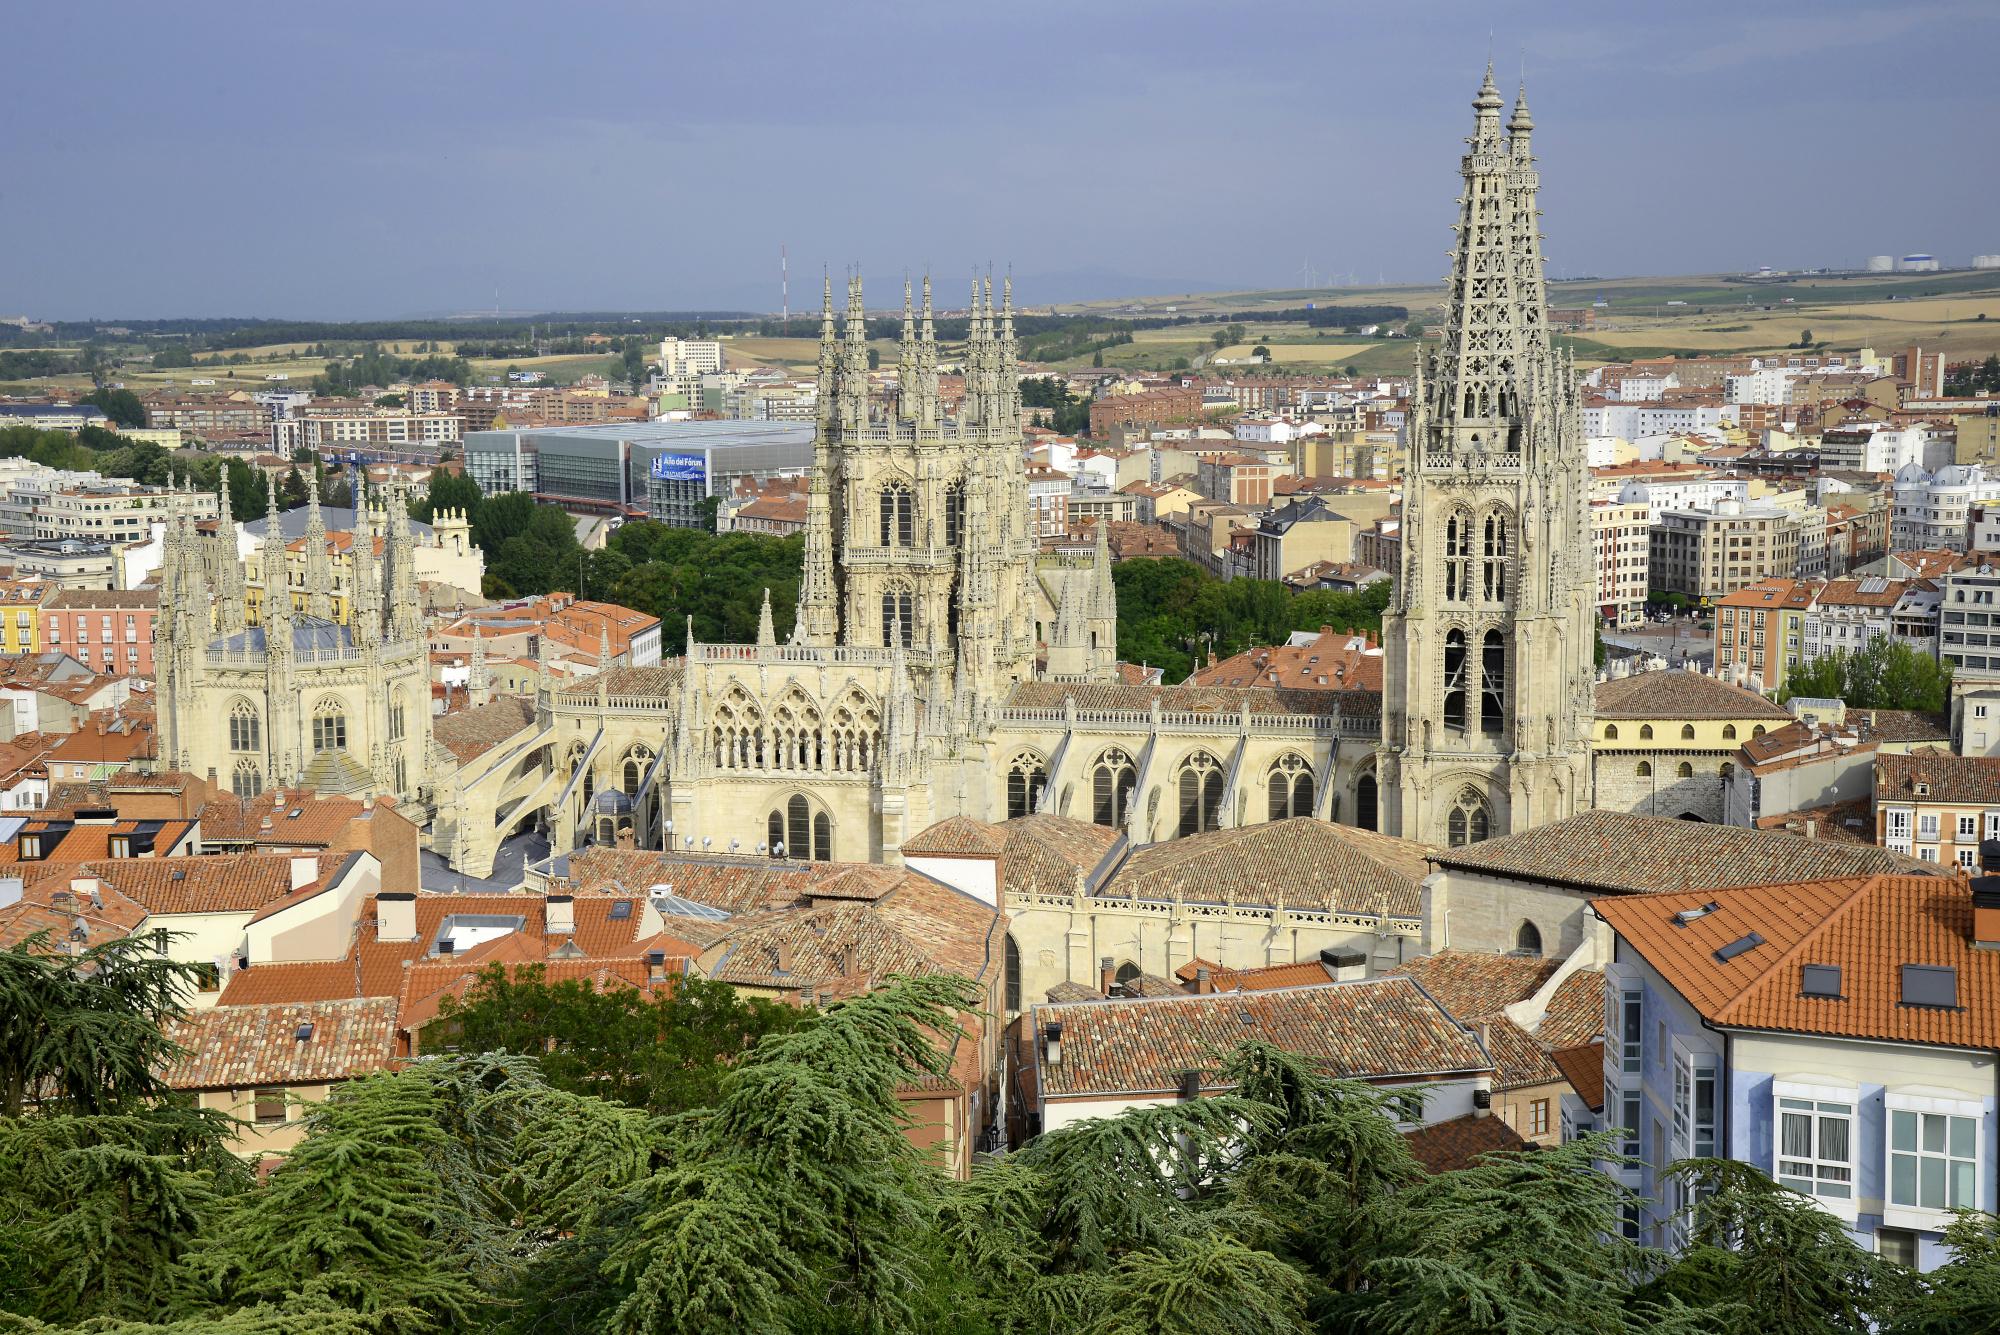 Burgos cathedral 10 burgos pictures spain in - Globalcolor burgos ...